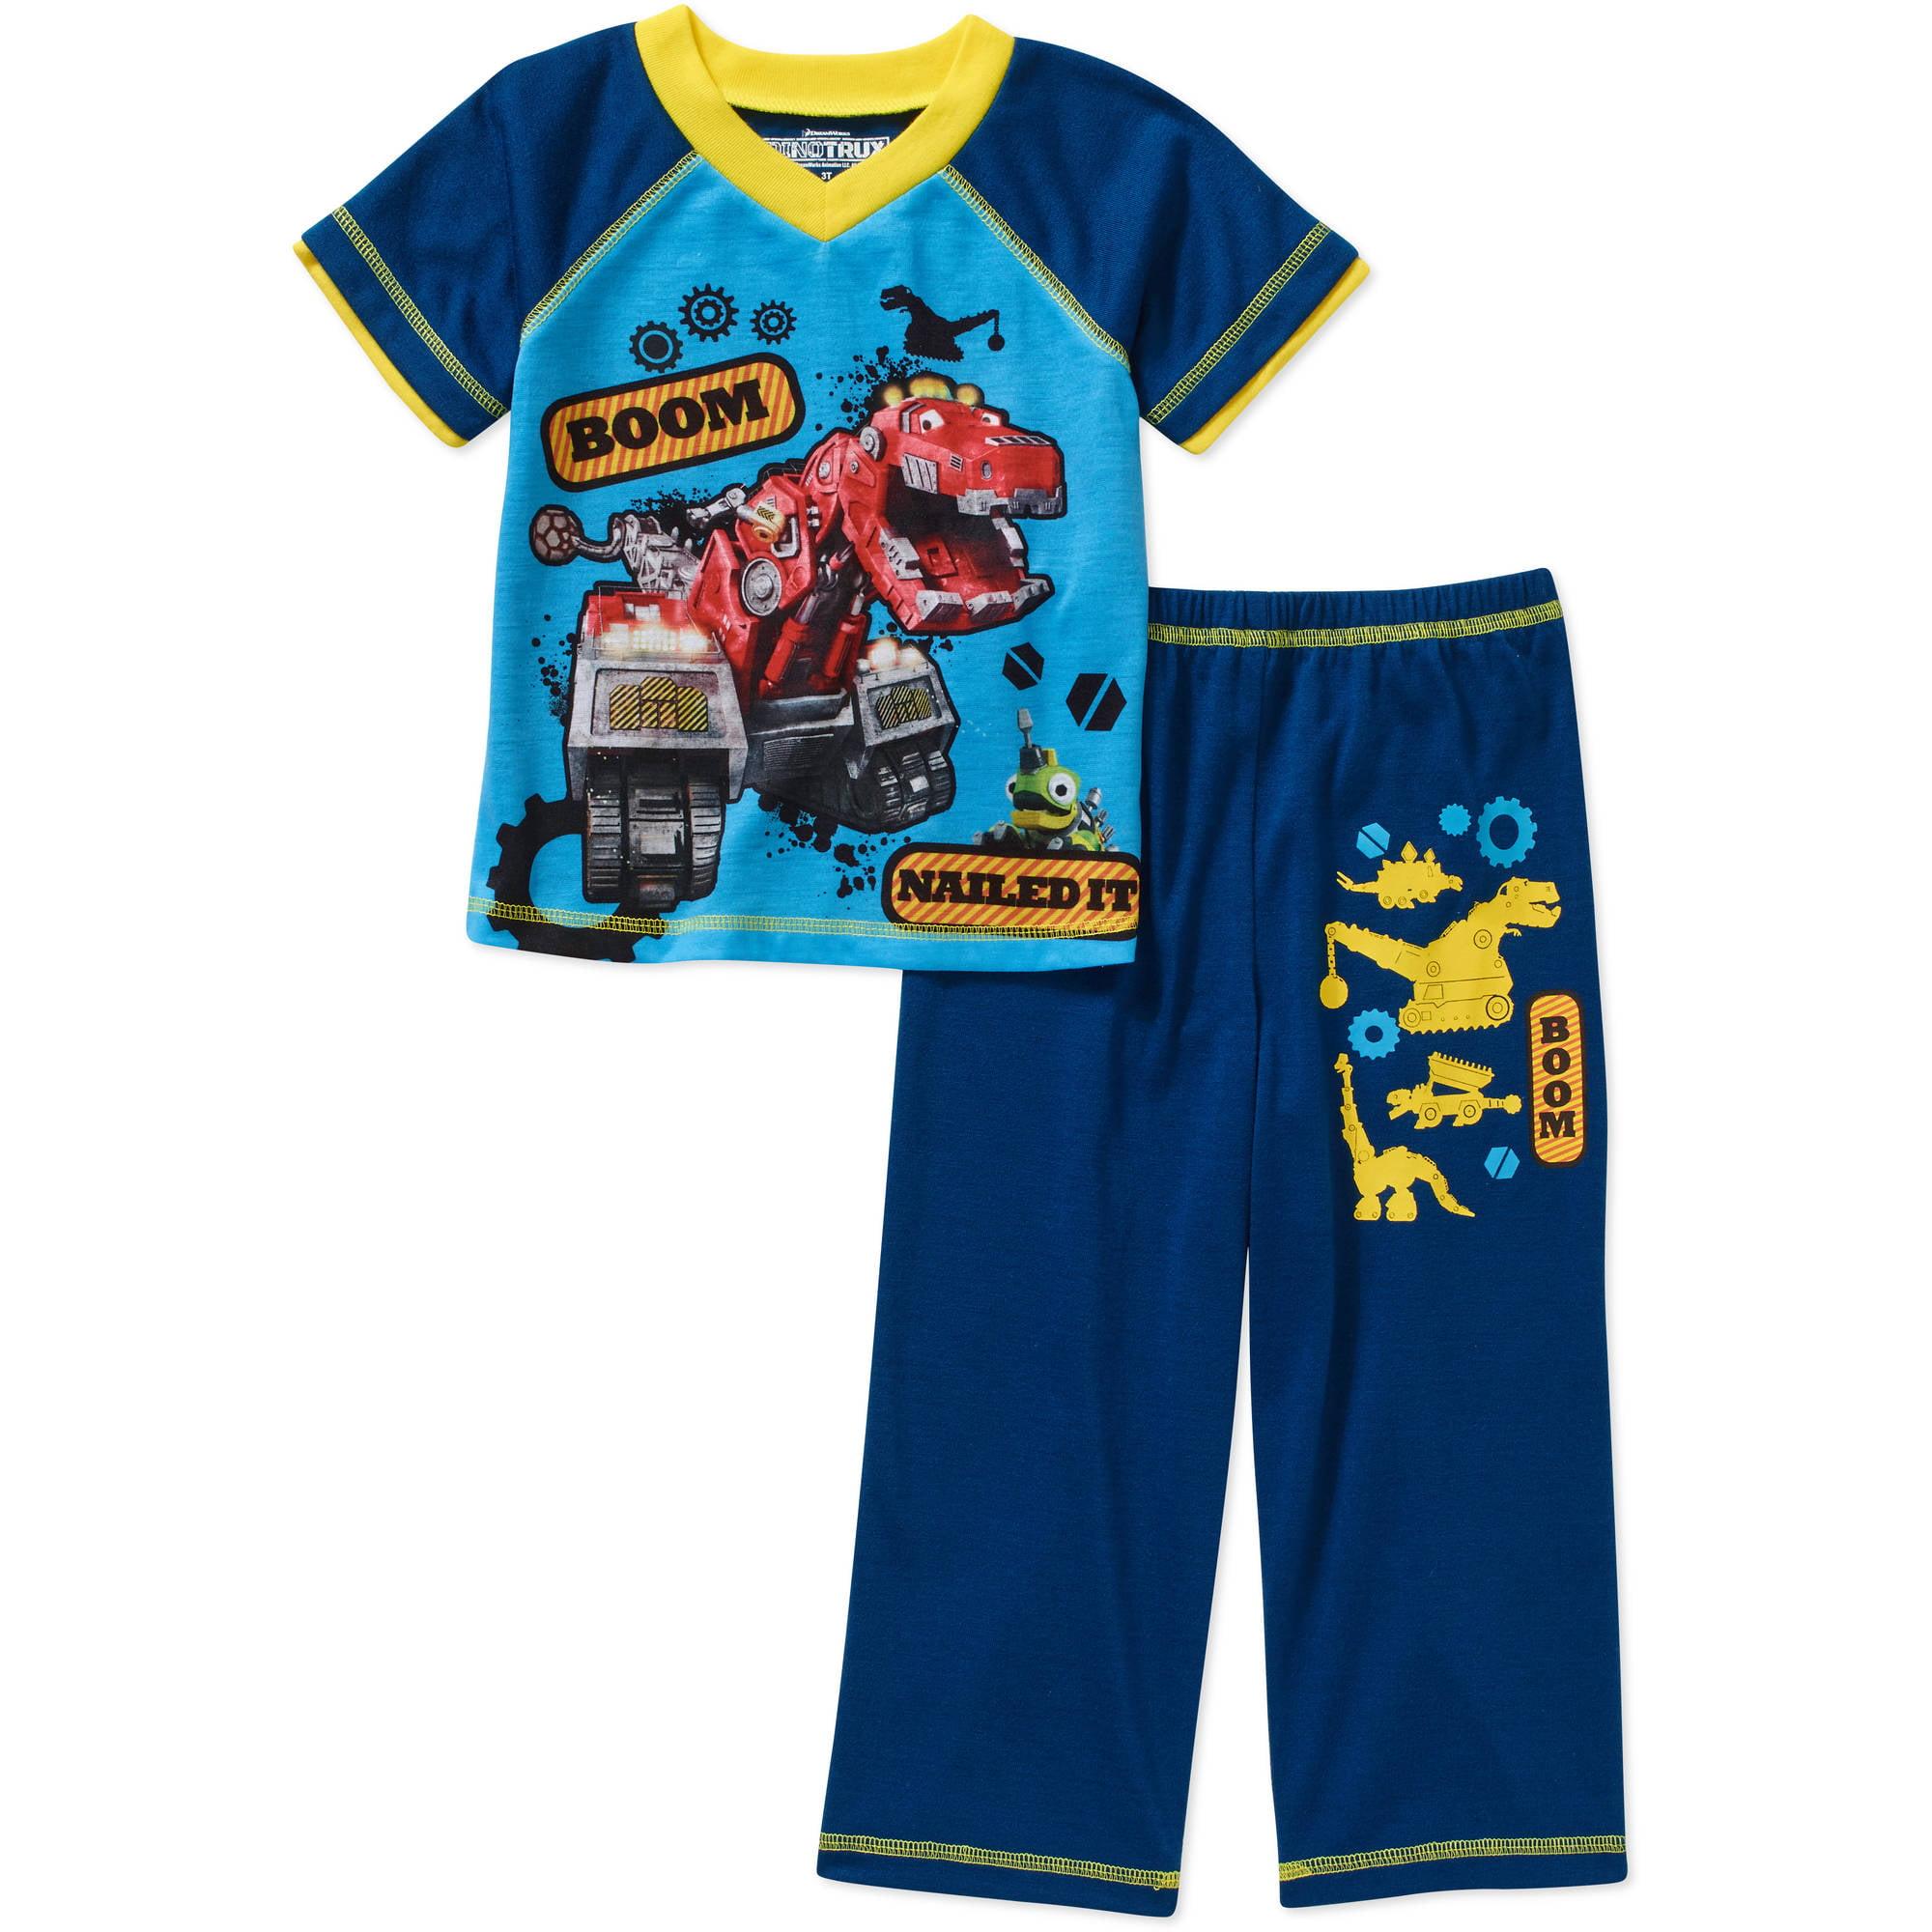 Dinotrux Toddler Boy Short Sleeve Pajama Set - Walmart.com